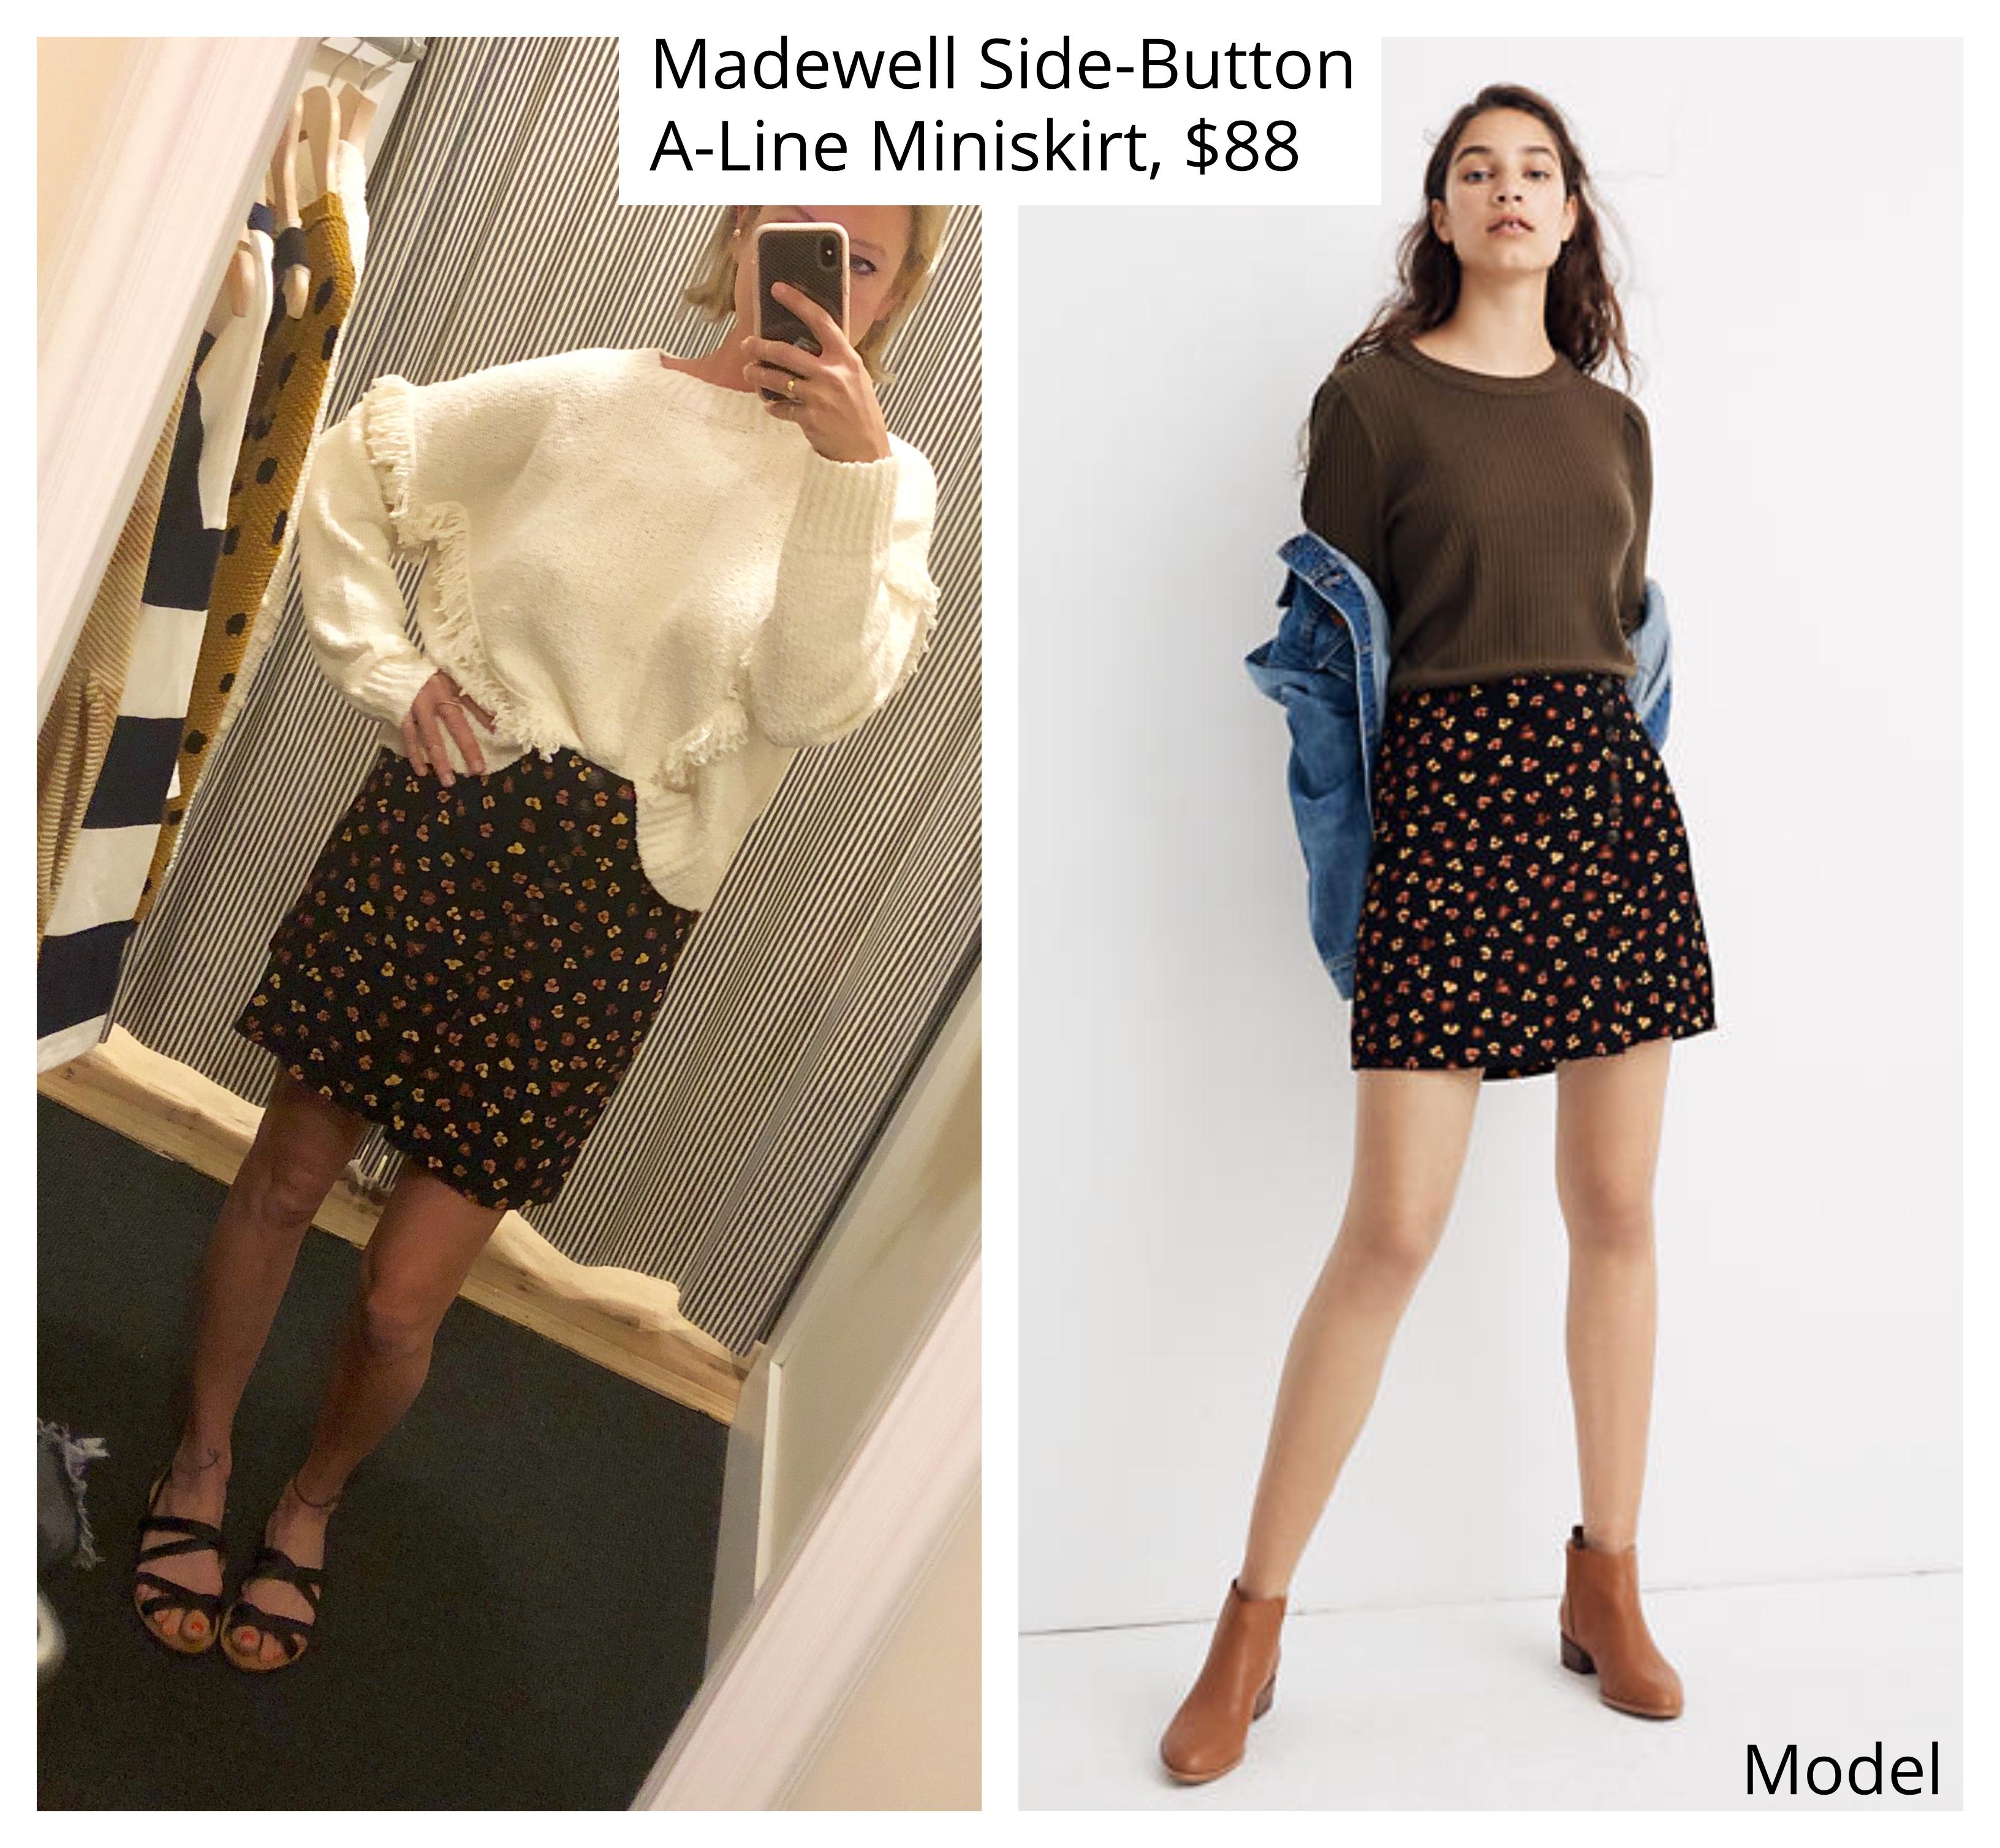 madewell floral print miniskirt